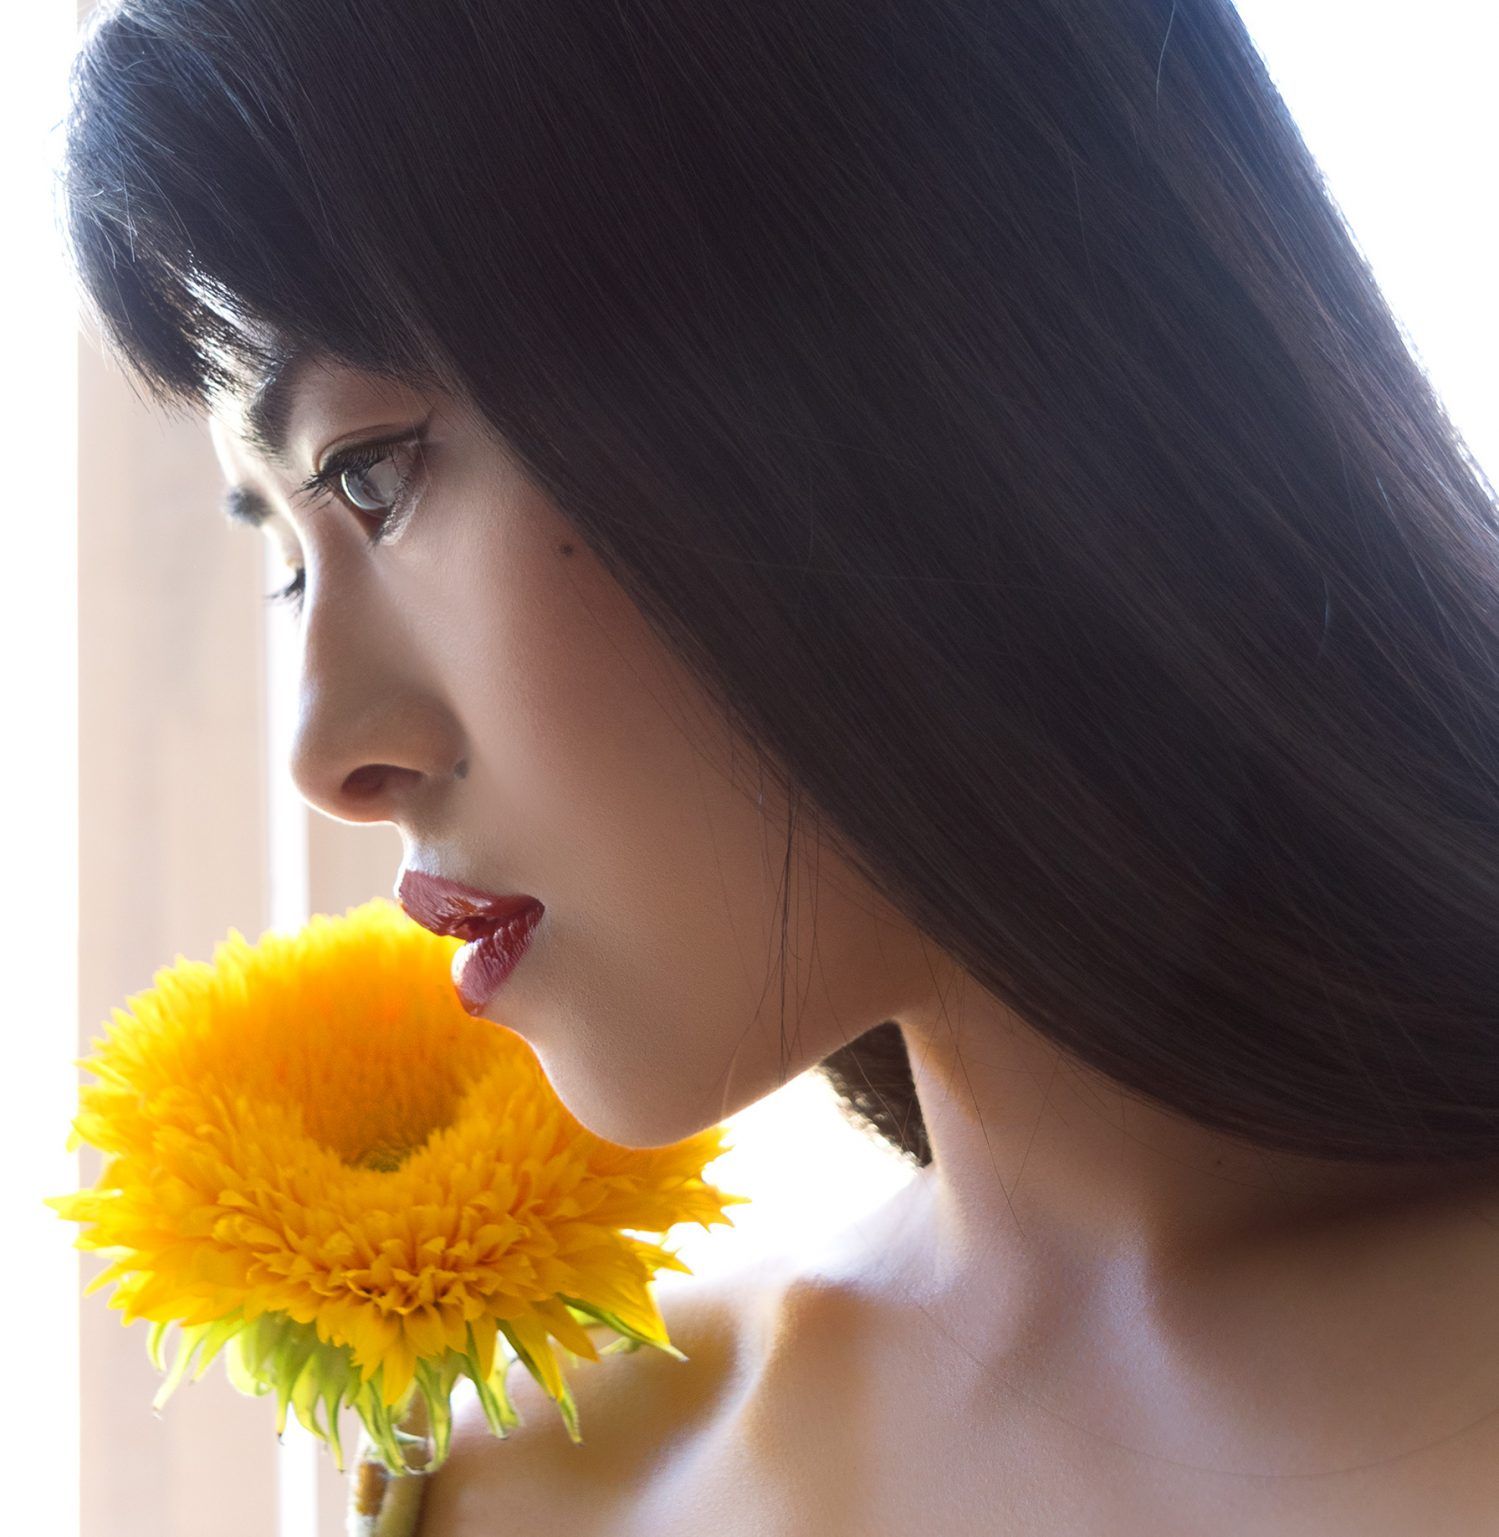 Sunflowers - A Beauty Post